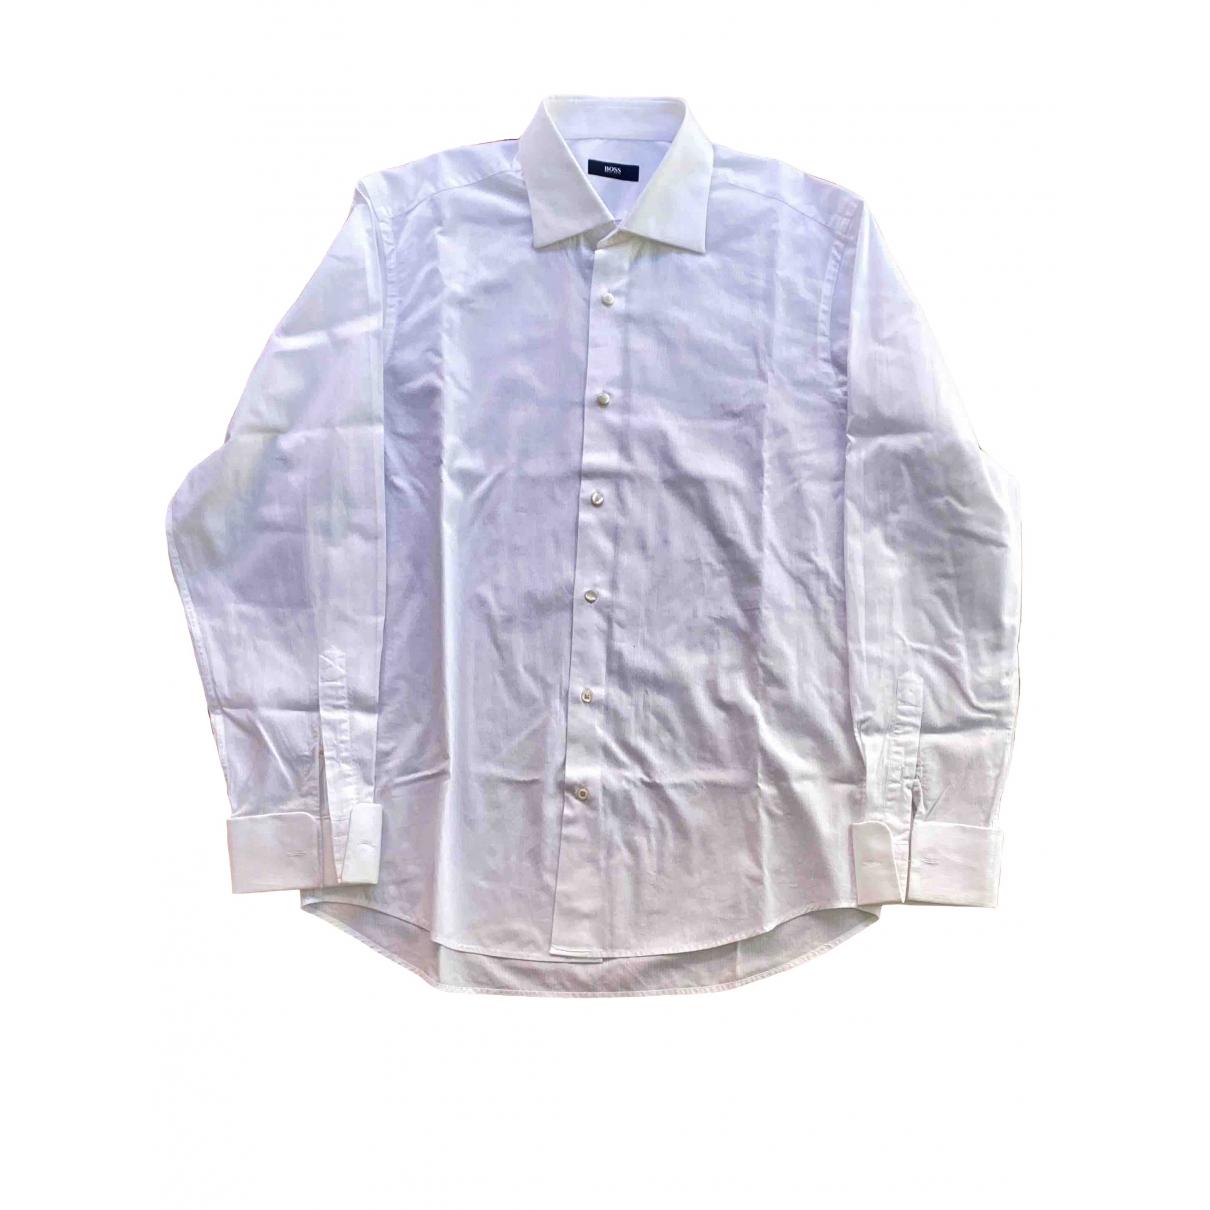 Boss \N White Cotton Shirts for Men 41 EU (tour de cou / collar)